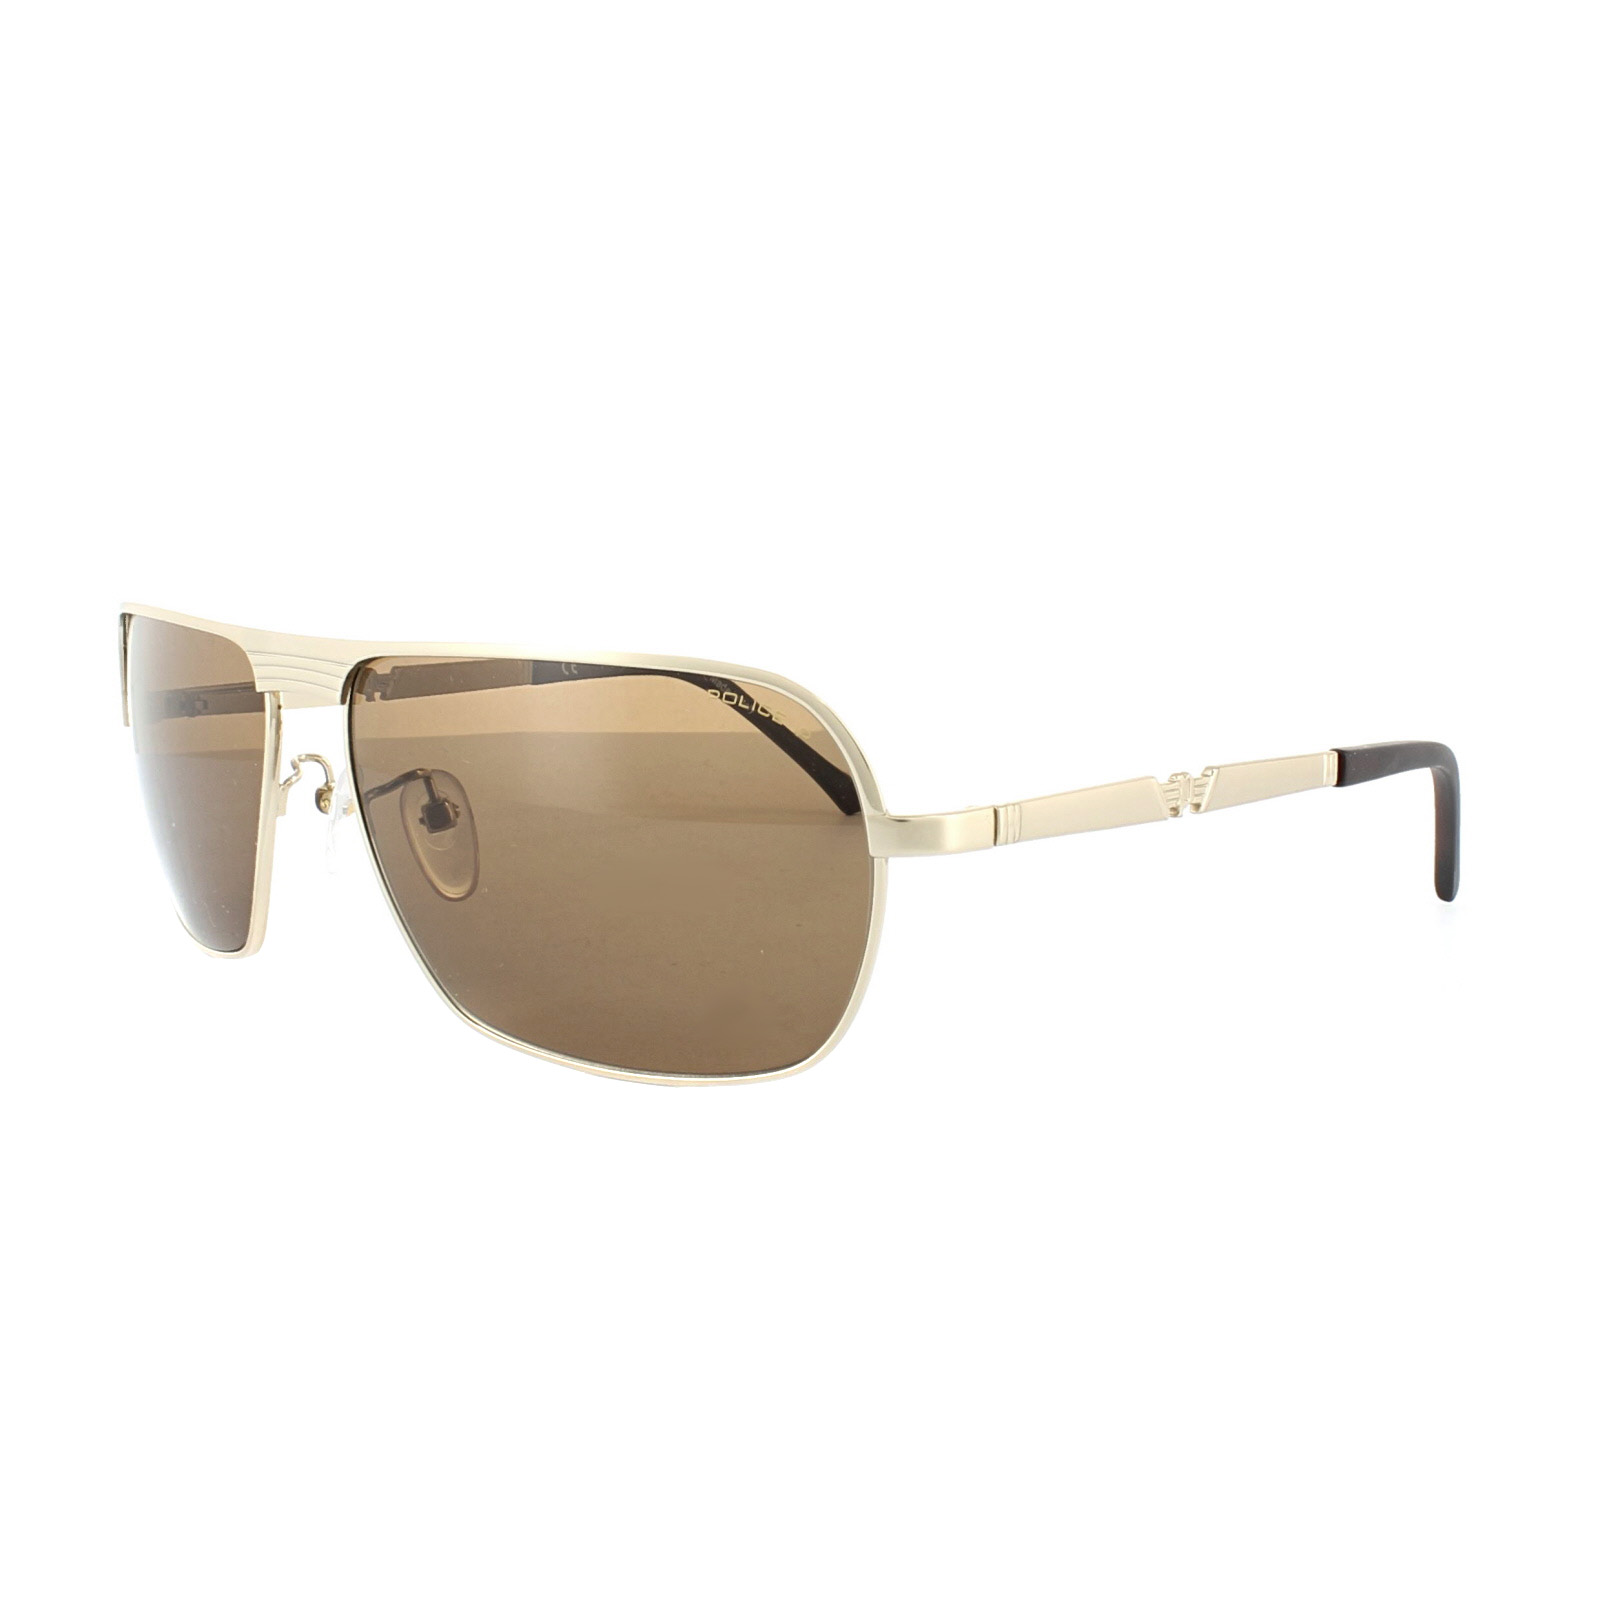 Gold Frame Police Sunglasses : Police Sunglasses S8745M 349P Gold Brown Polarized eBay